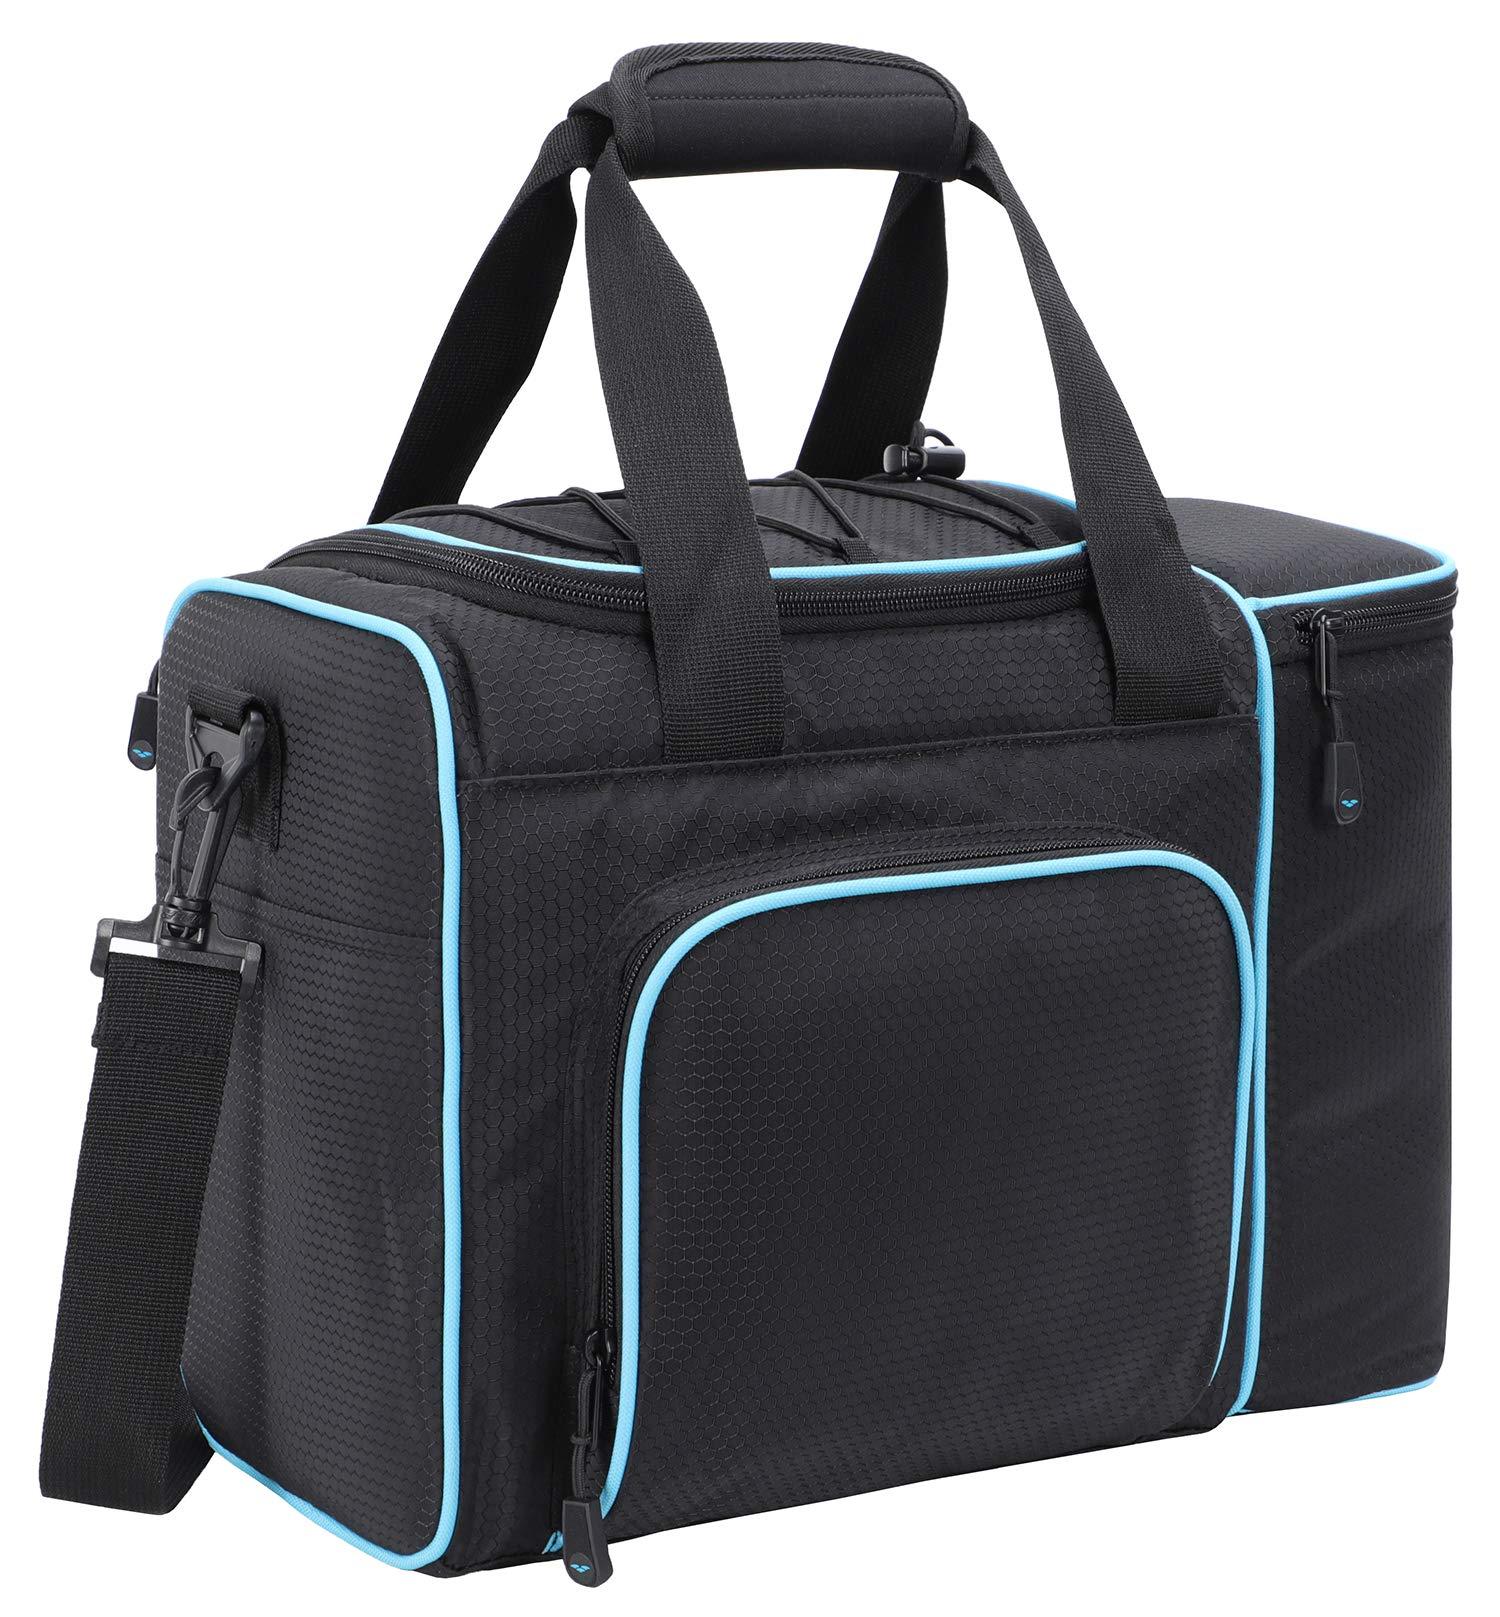 MIER Large Adult Lunch Bag for Men Women Insulated Soft Cooler for Picnic, Kayak, Beach, Grocery, Work, Travel, 2 Decks Cooler, Black/Blue